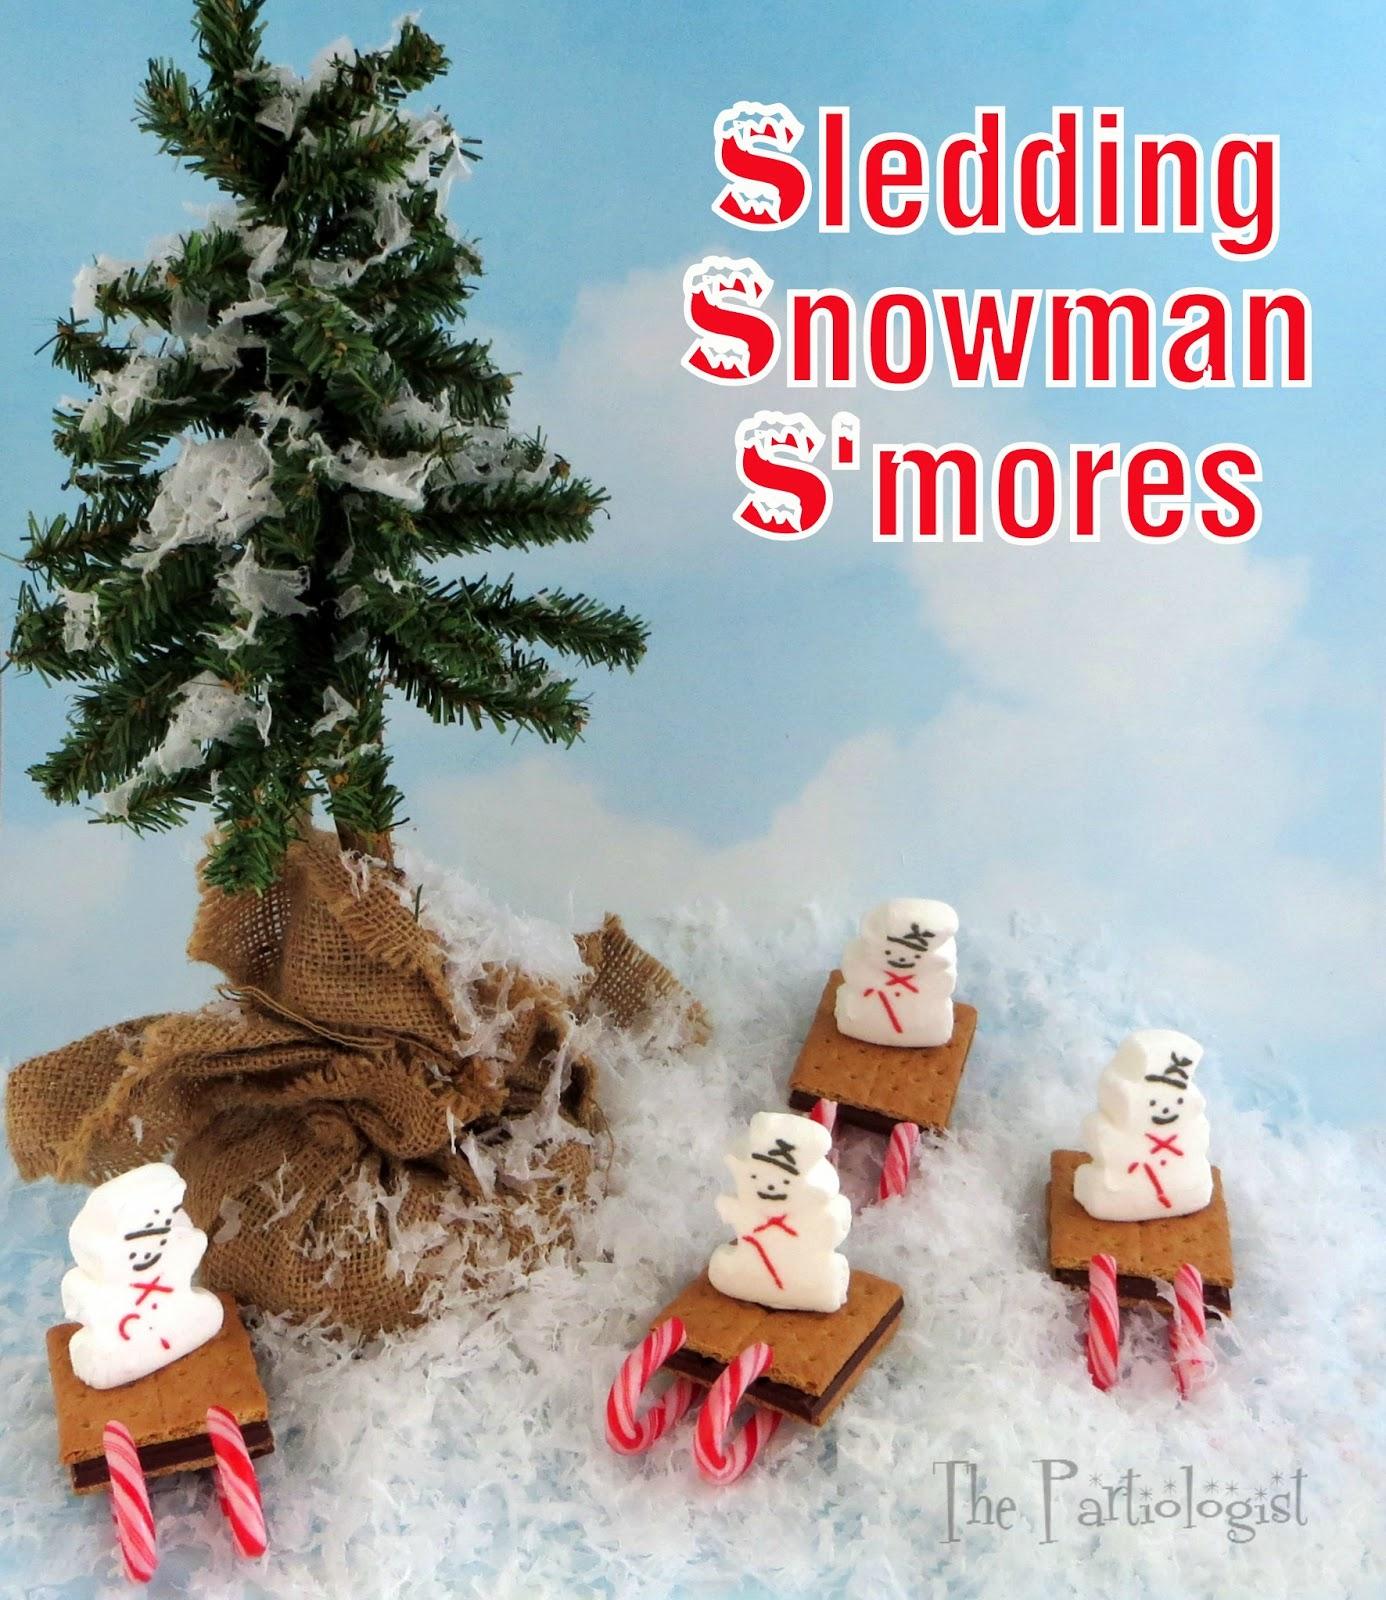 The Partiologist Sledding Snowman S mores